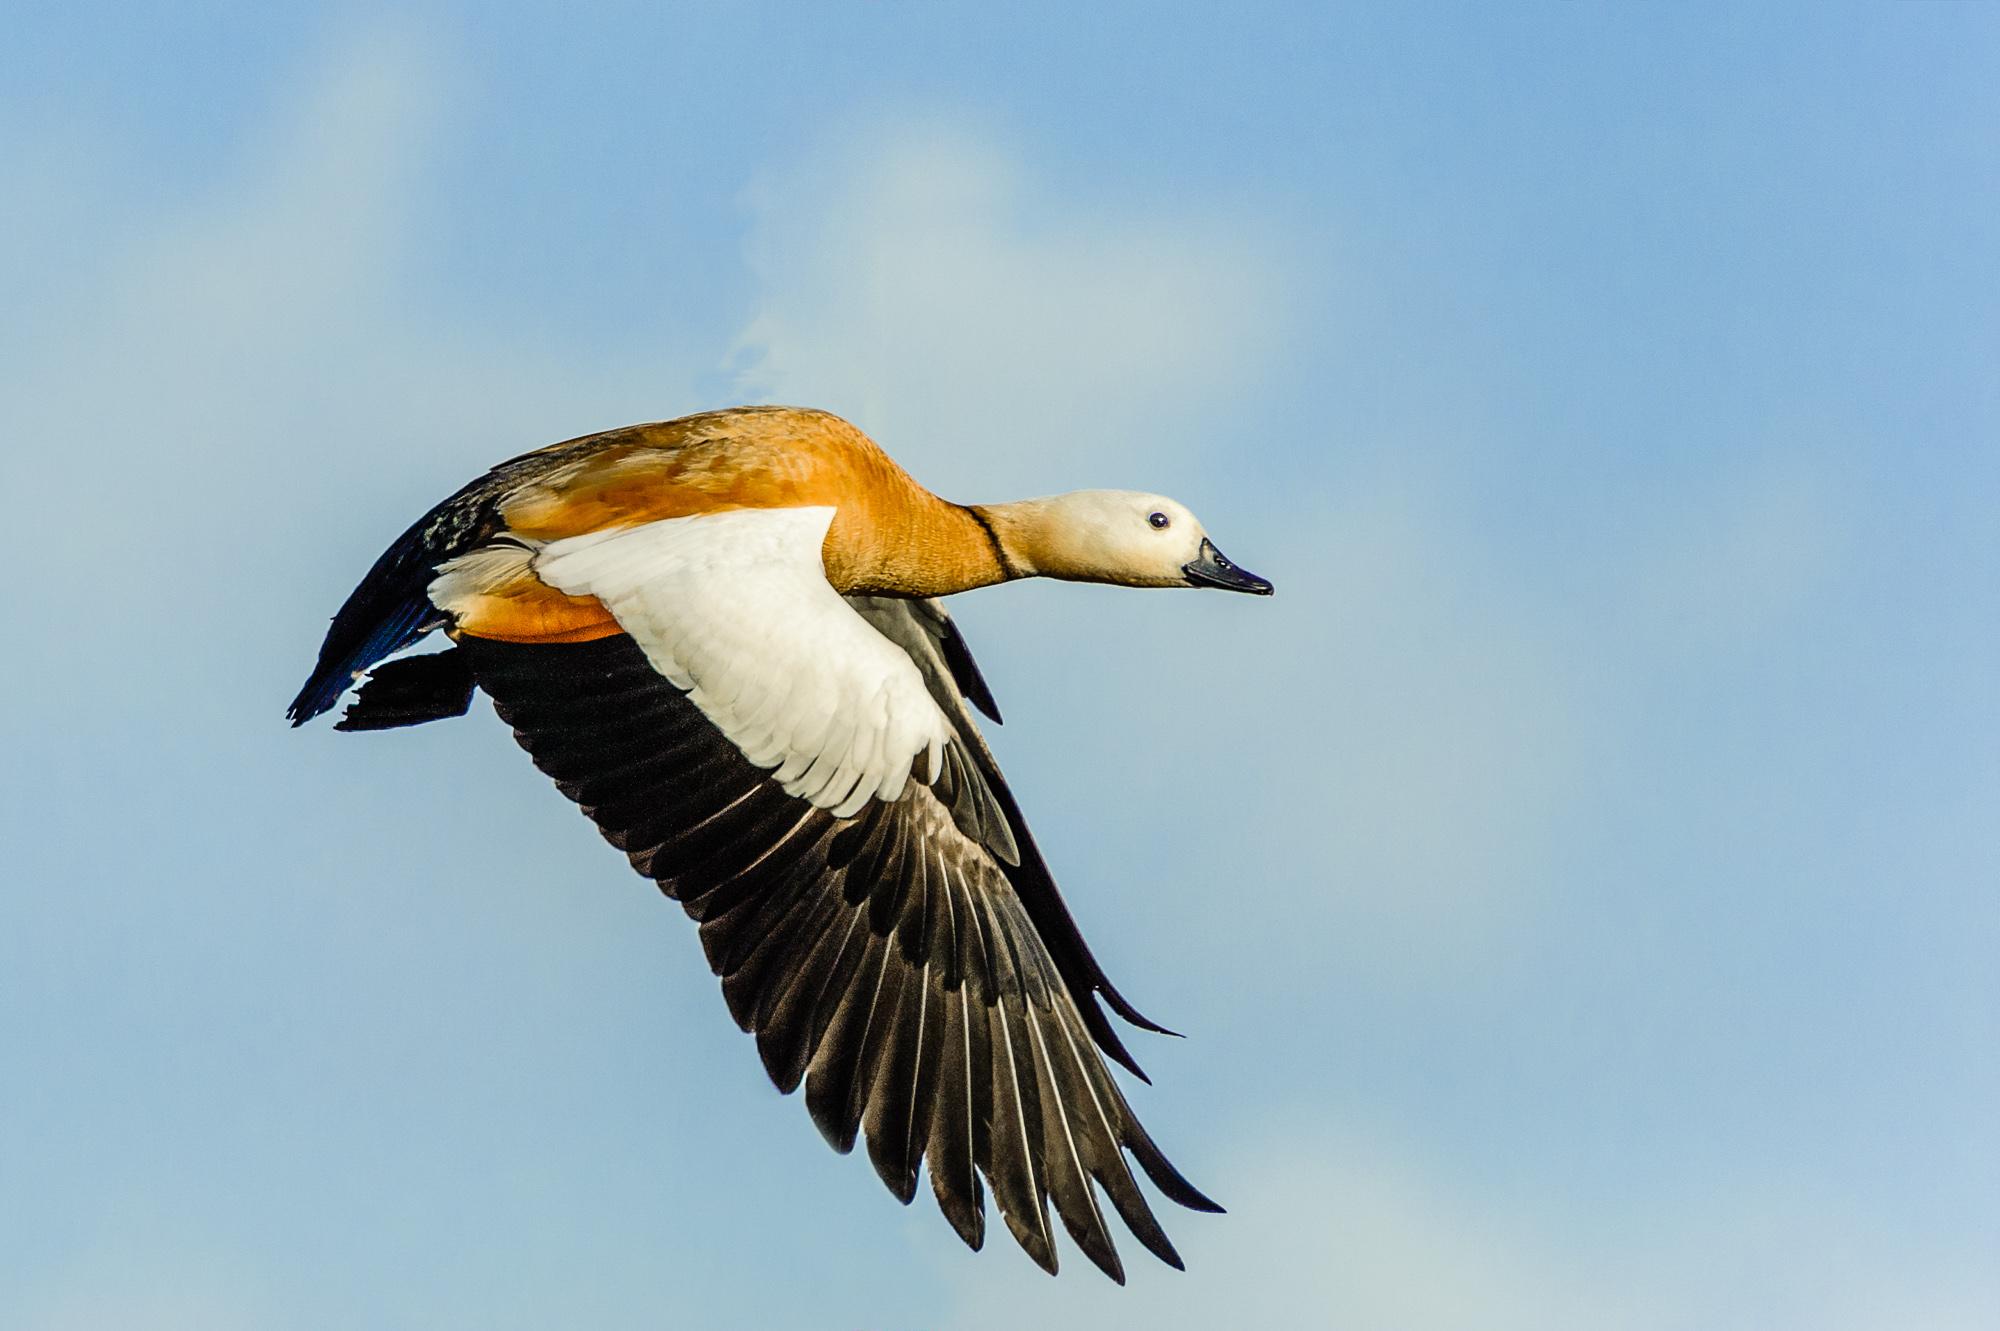 Tarro canelo (Tadorna ferruginea) al vuelo